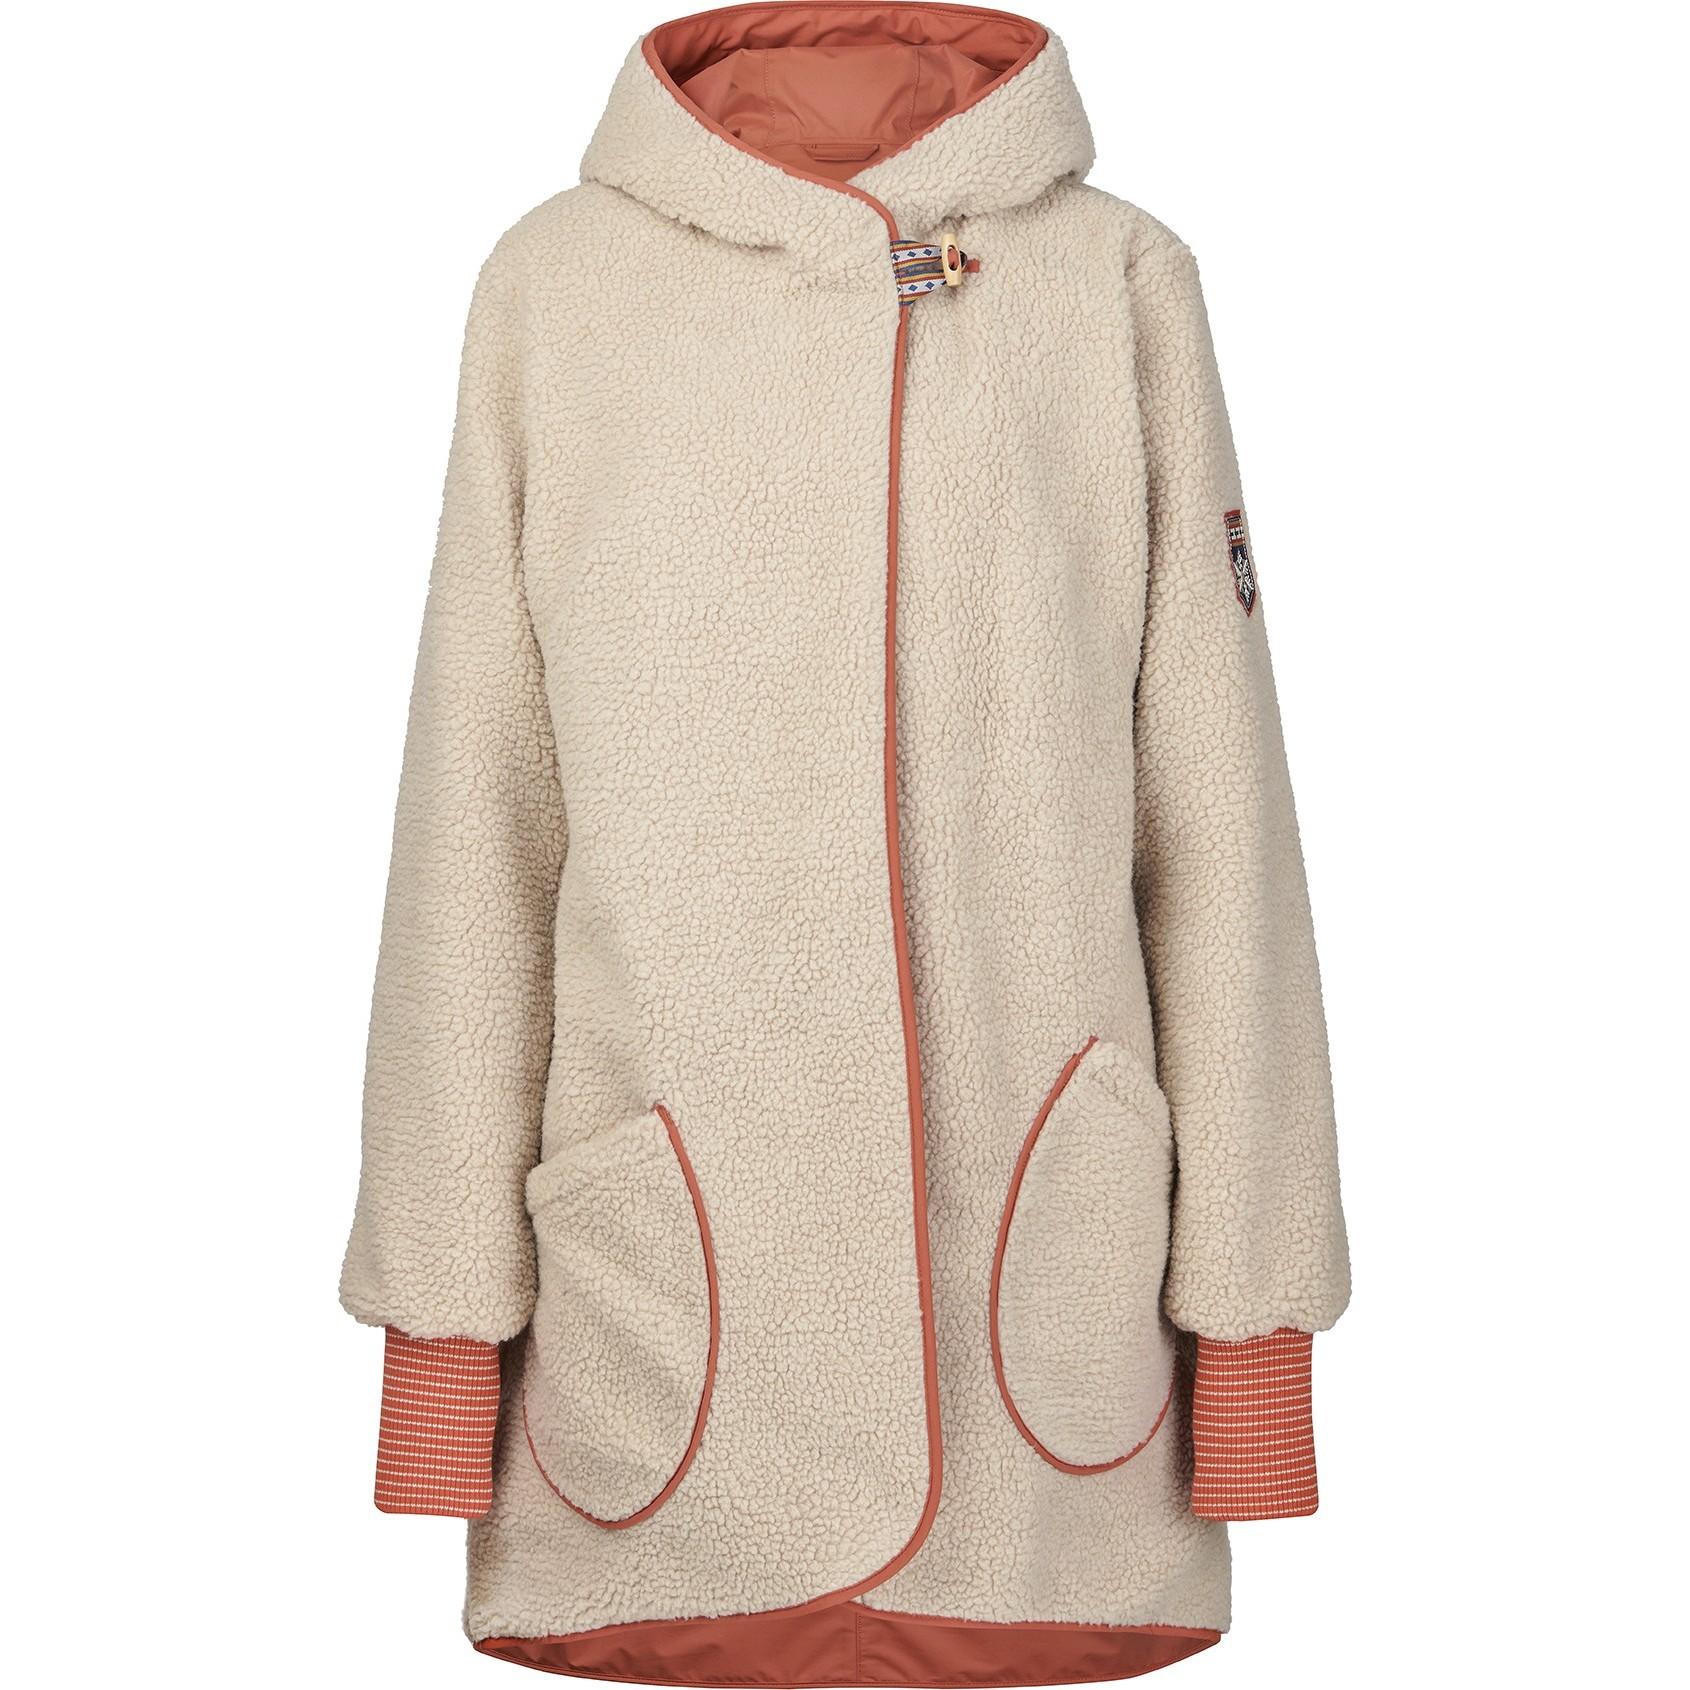 Image of Finside SUOMUKKA Women Reversible Winter Jacket - chili/pebble